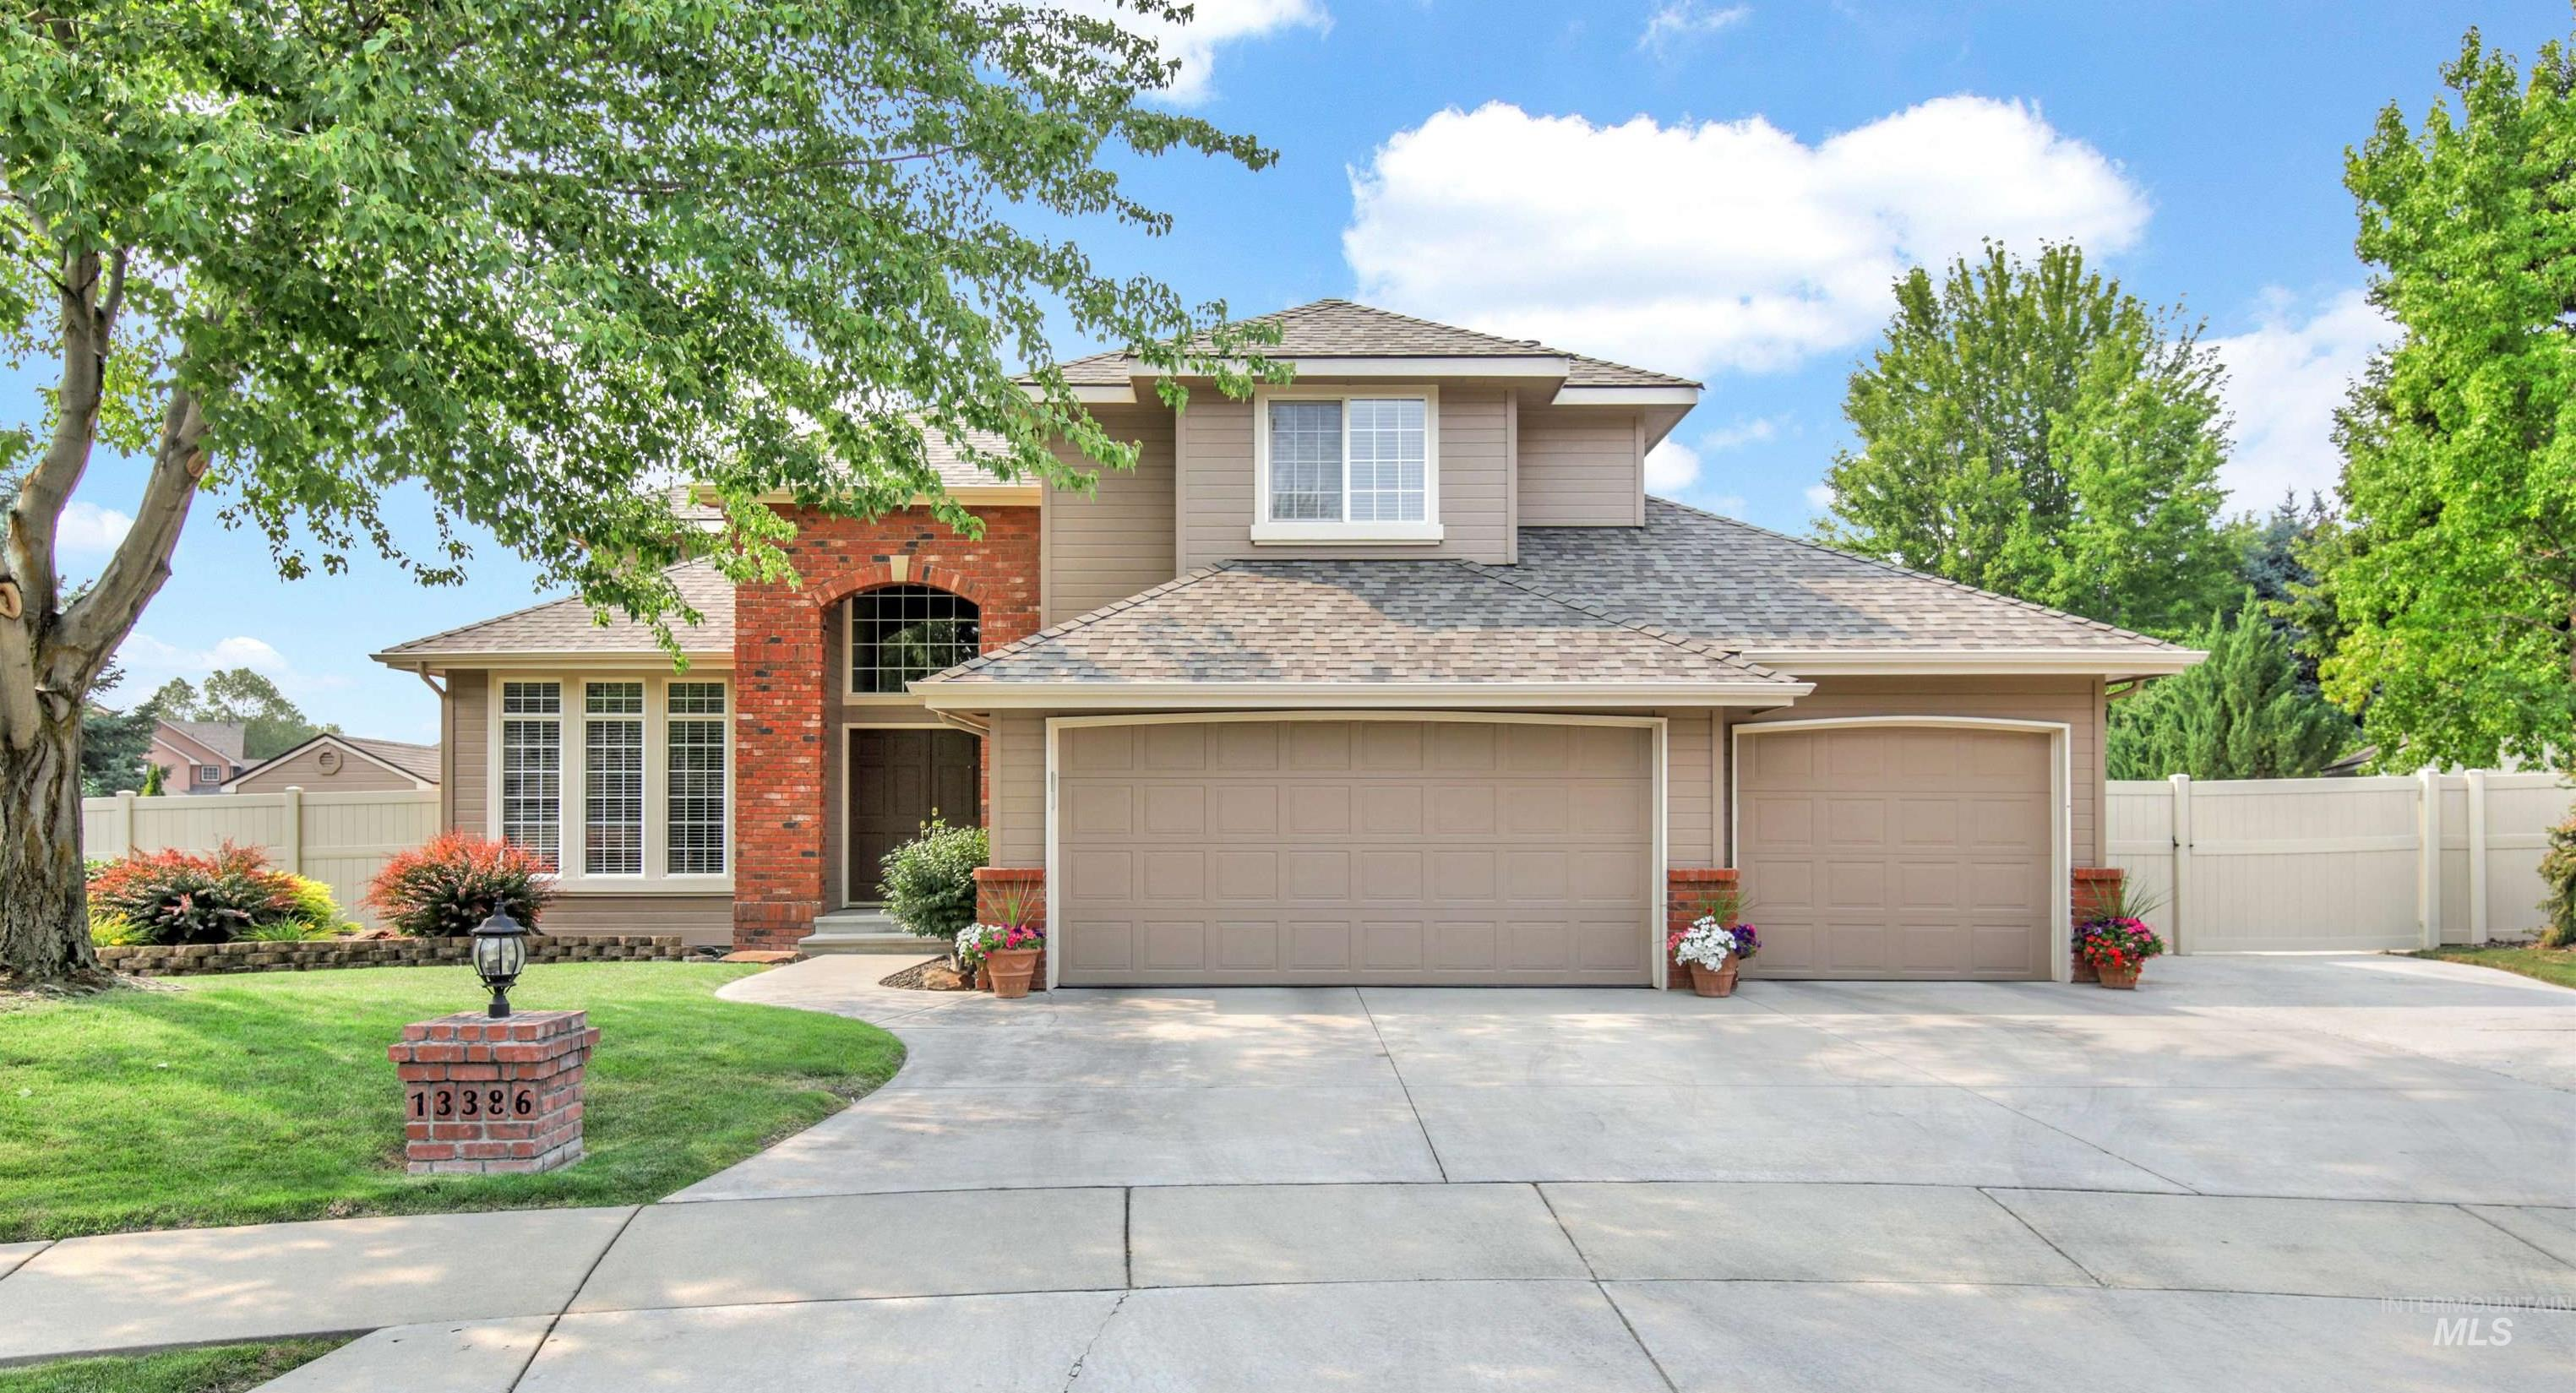 13386 W Woodspring Ct Property Photo